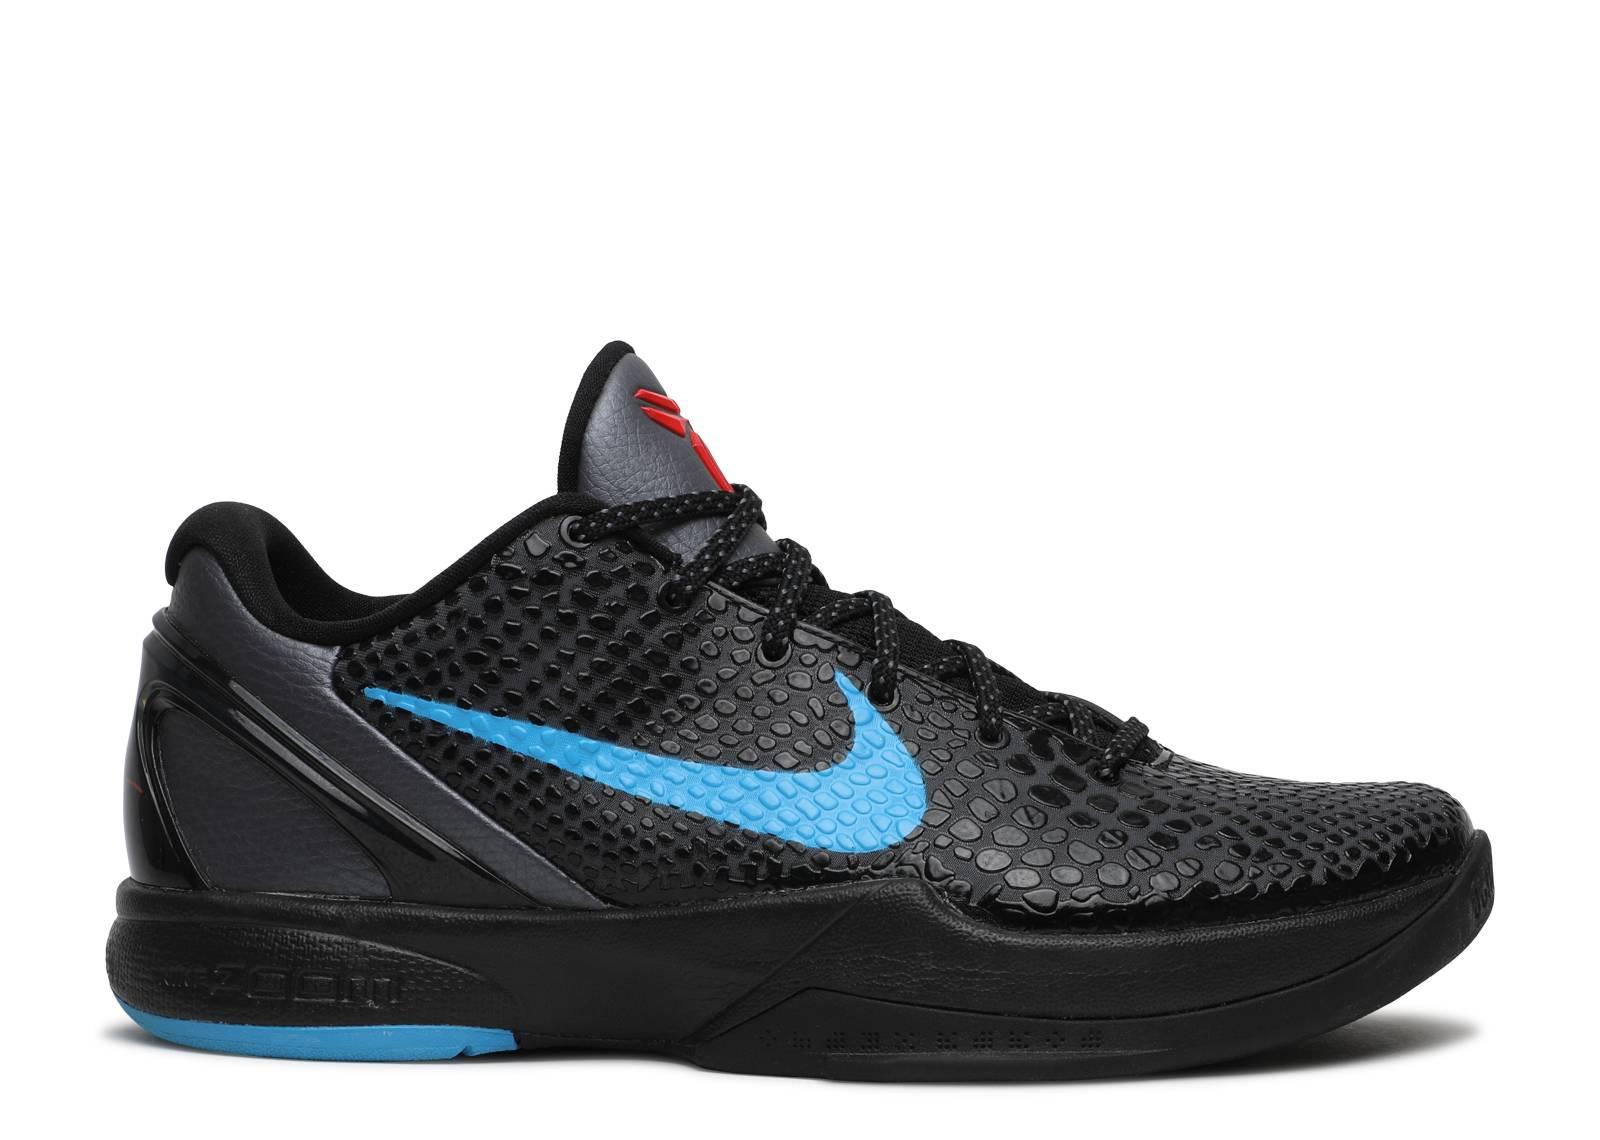 separation shoes b4113 21168 clearance nike kobe 6 grey 79881 f7c9a